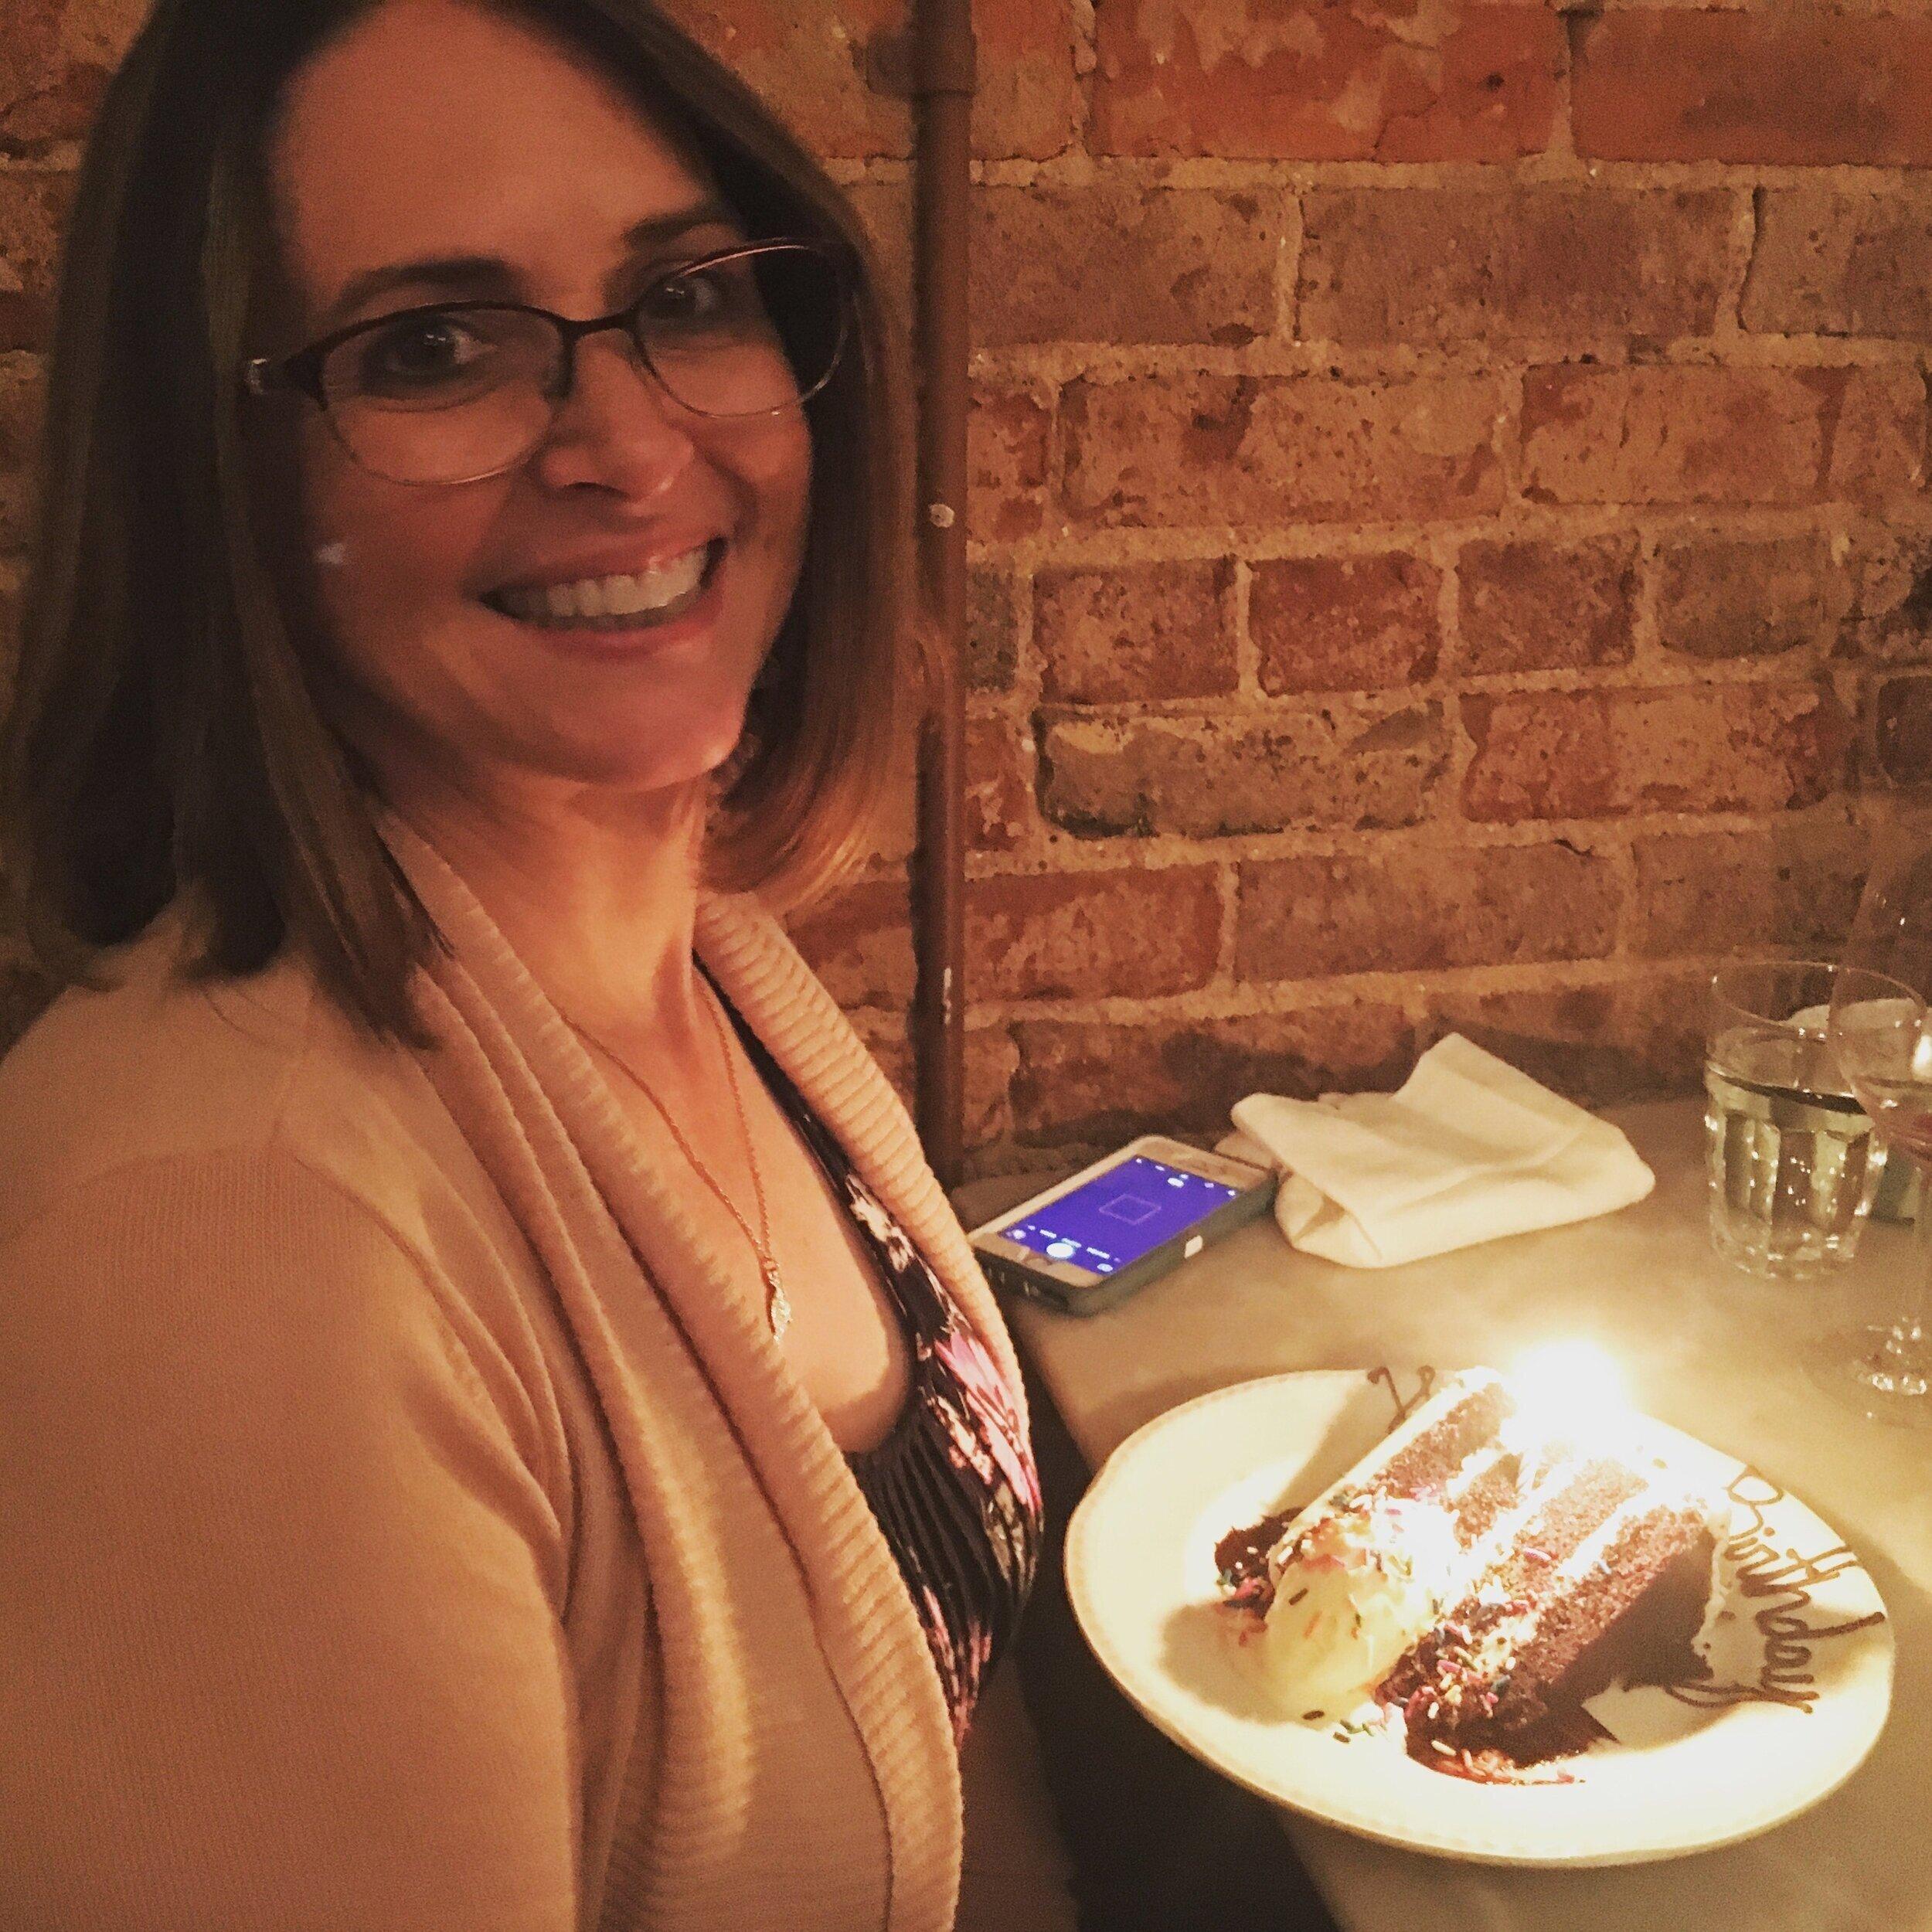 Birthday Cake for the Birthday Girl